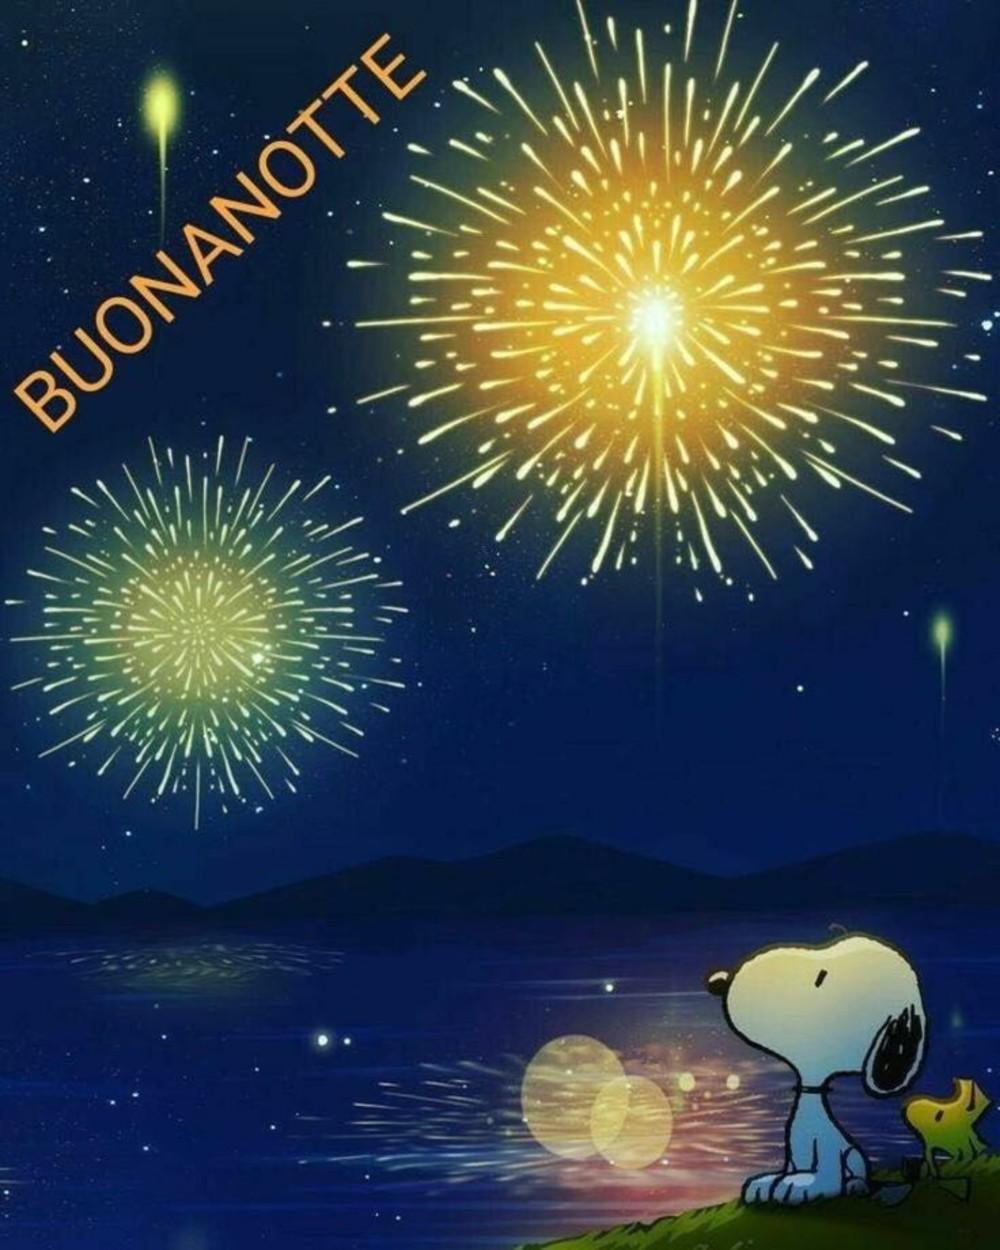 Immagini Buonanotte Snoopy Fotowhatsapp It